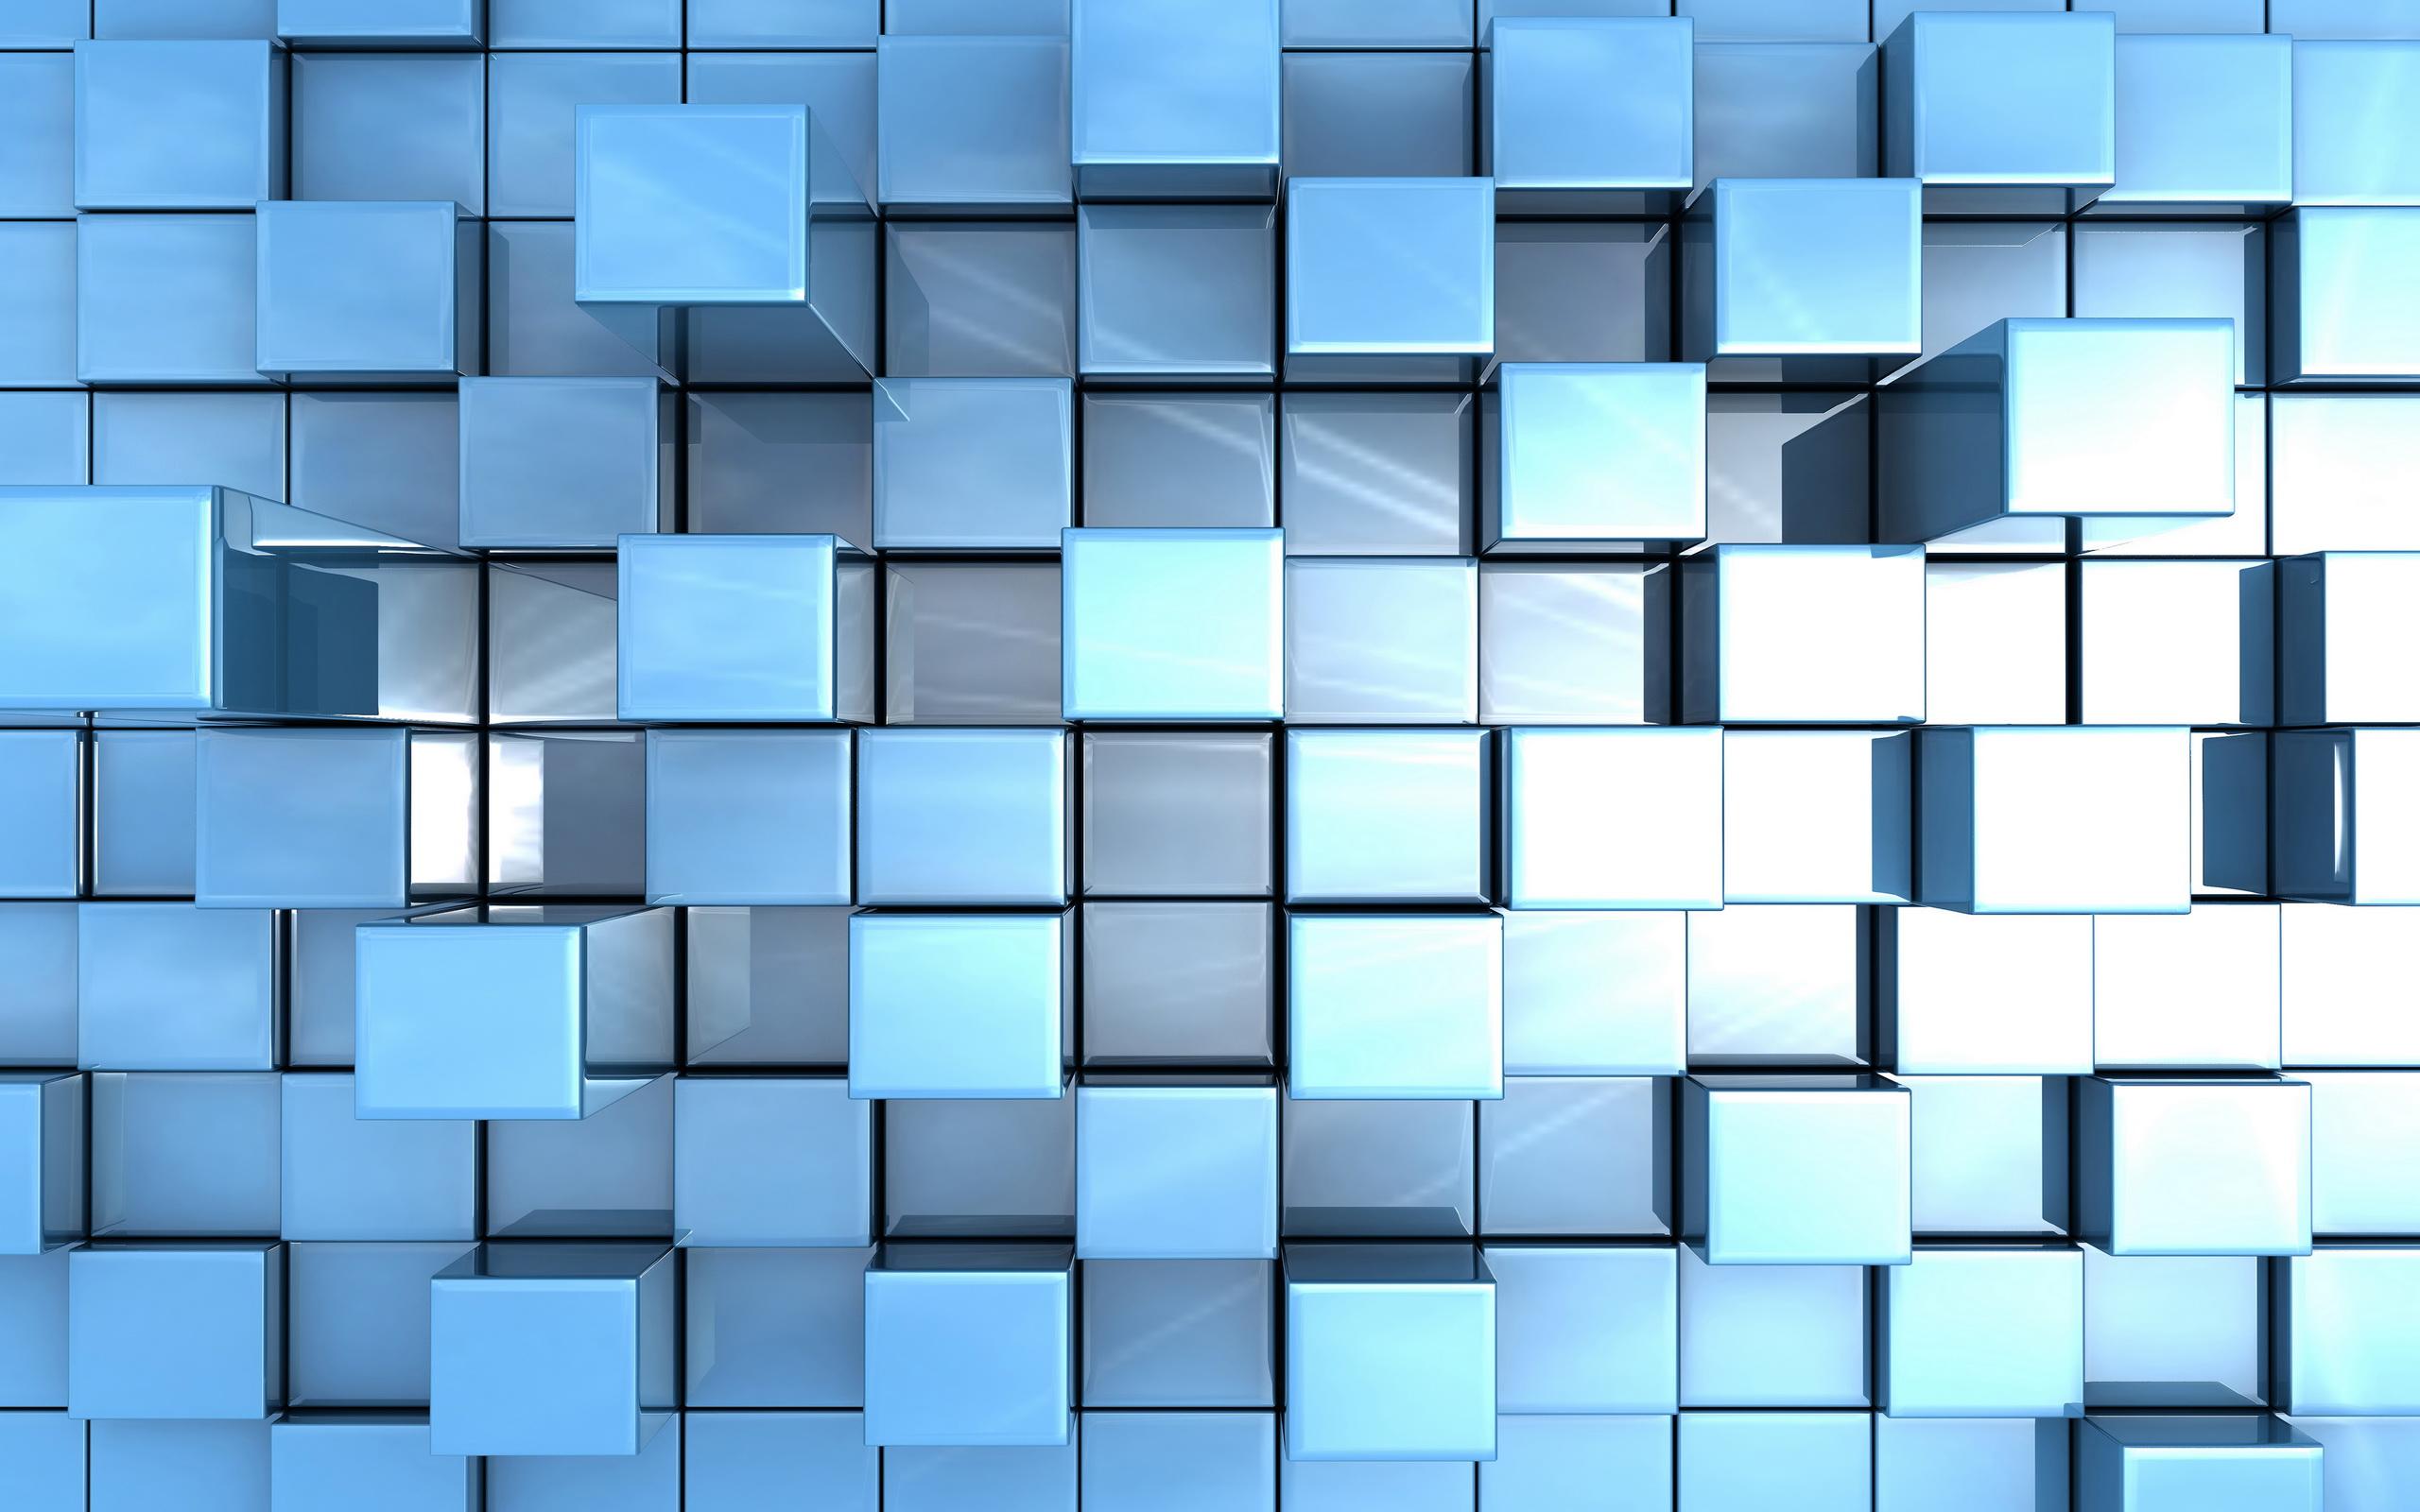 Cube Computer Wallpapers Desktop Backgrounds 2560x1600 ID438444 2560x1600